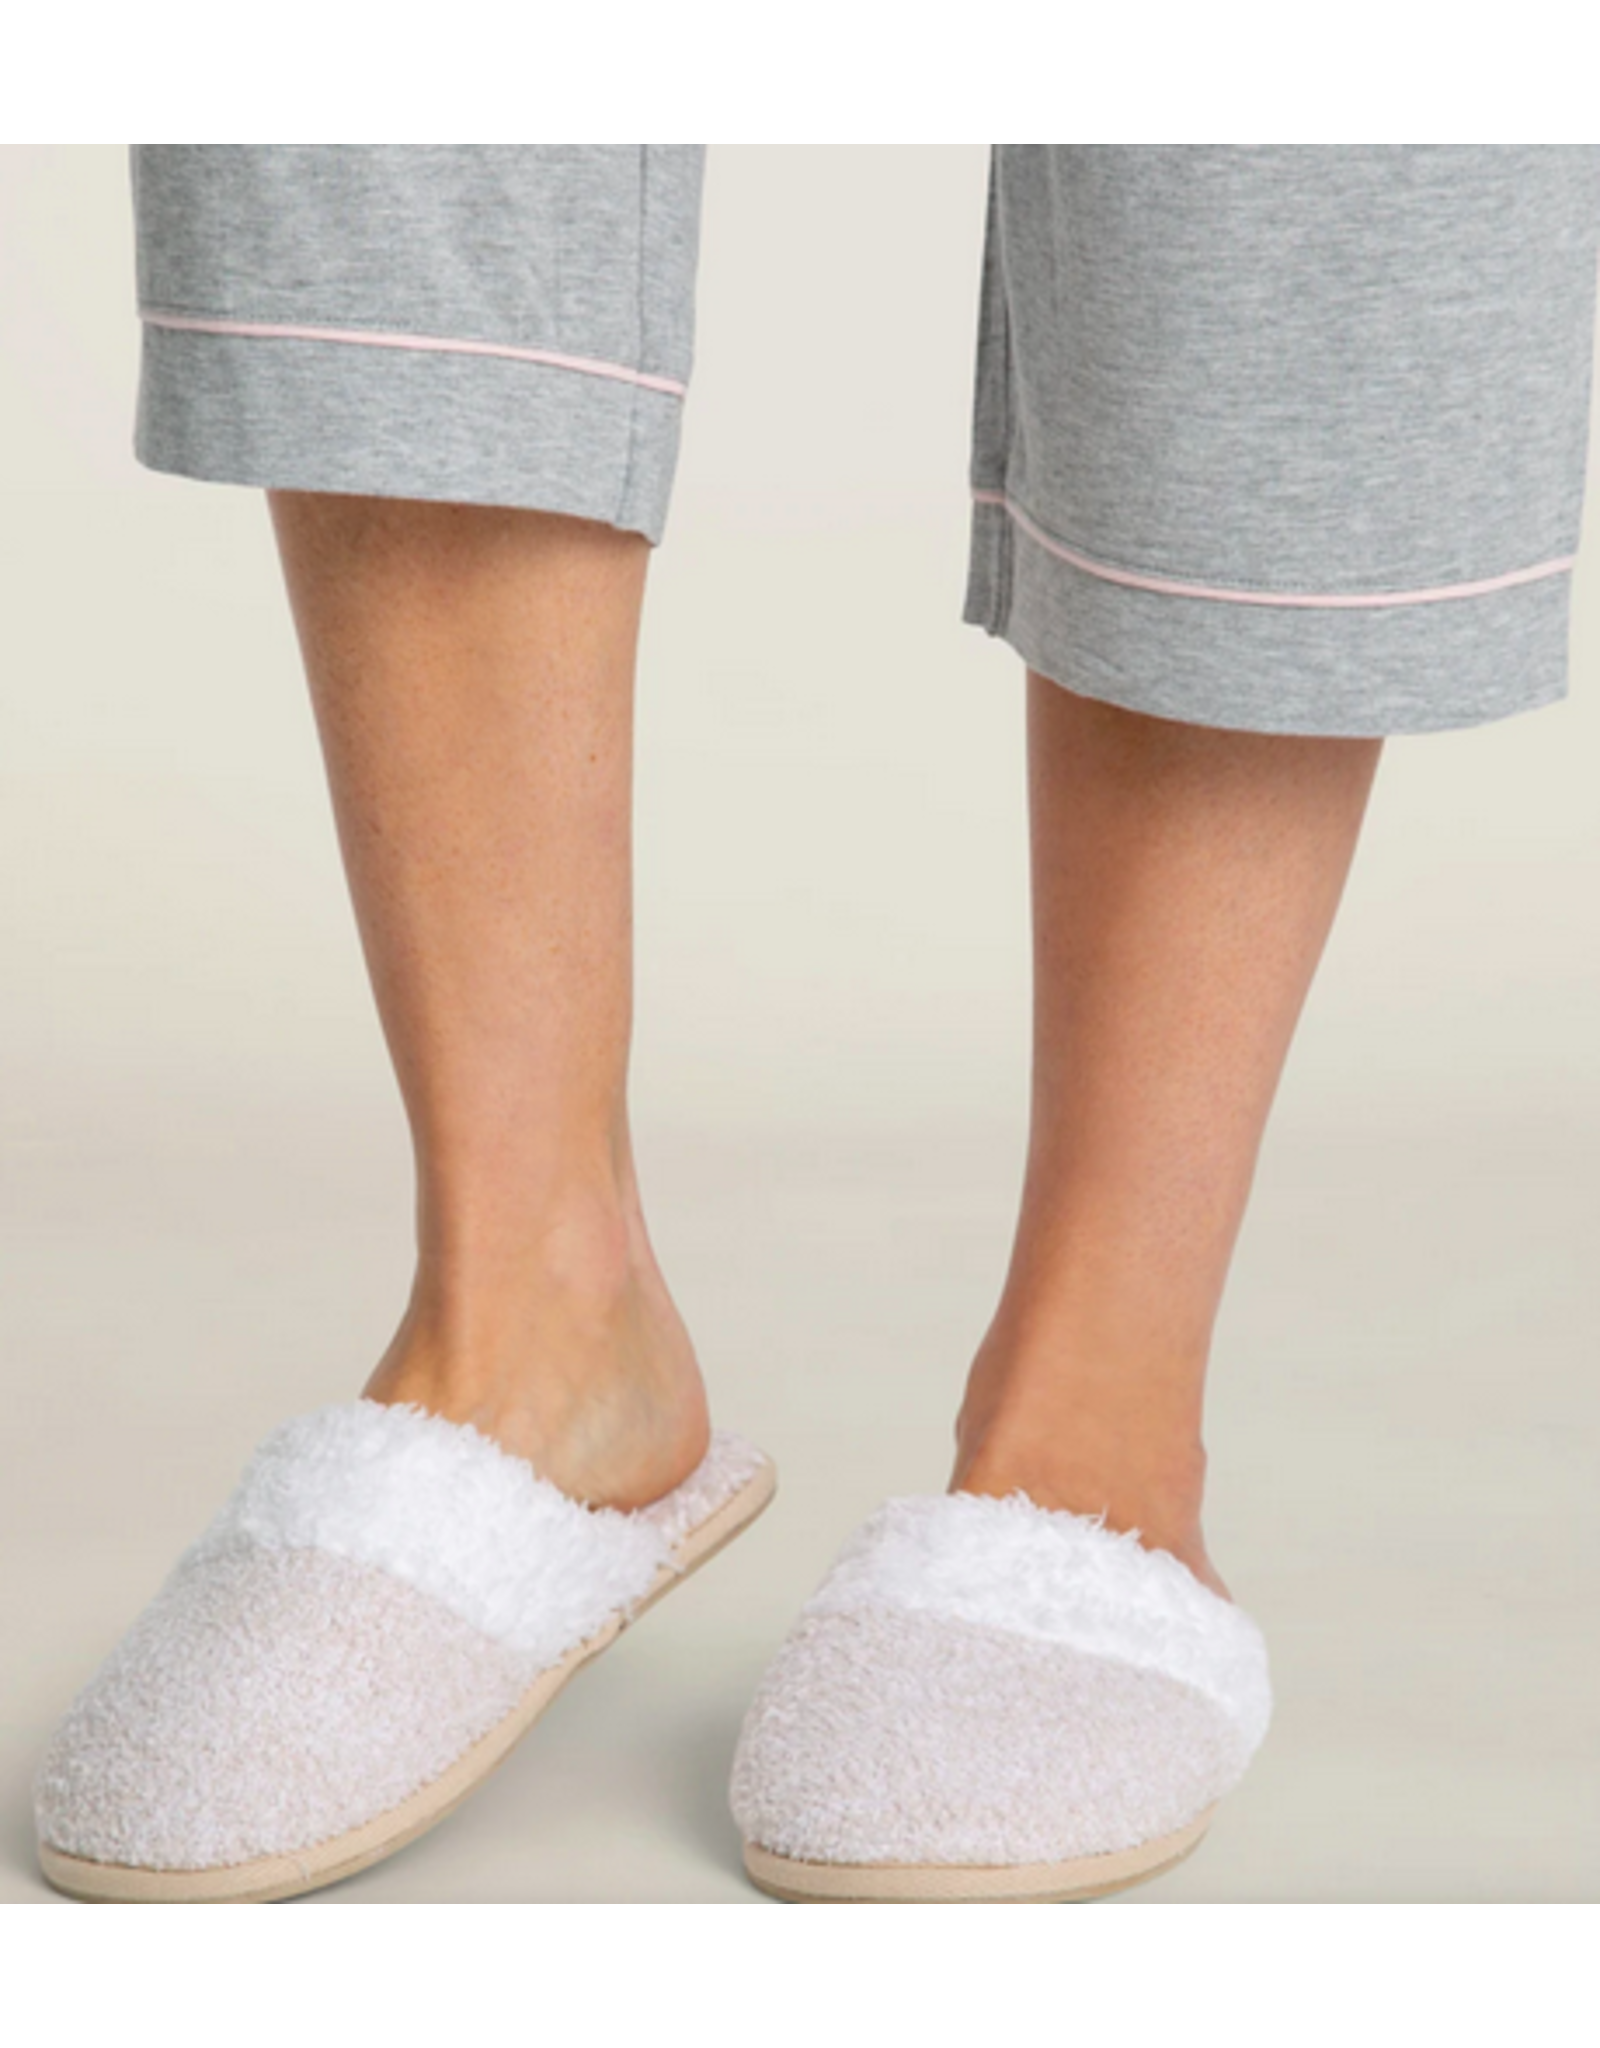 Barefoot Dreams CozyChic Malibu Slippers in Stone M (7/8)